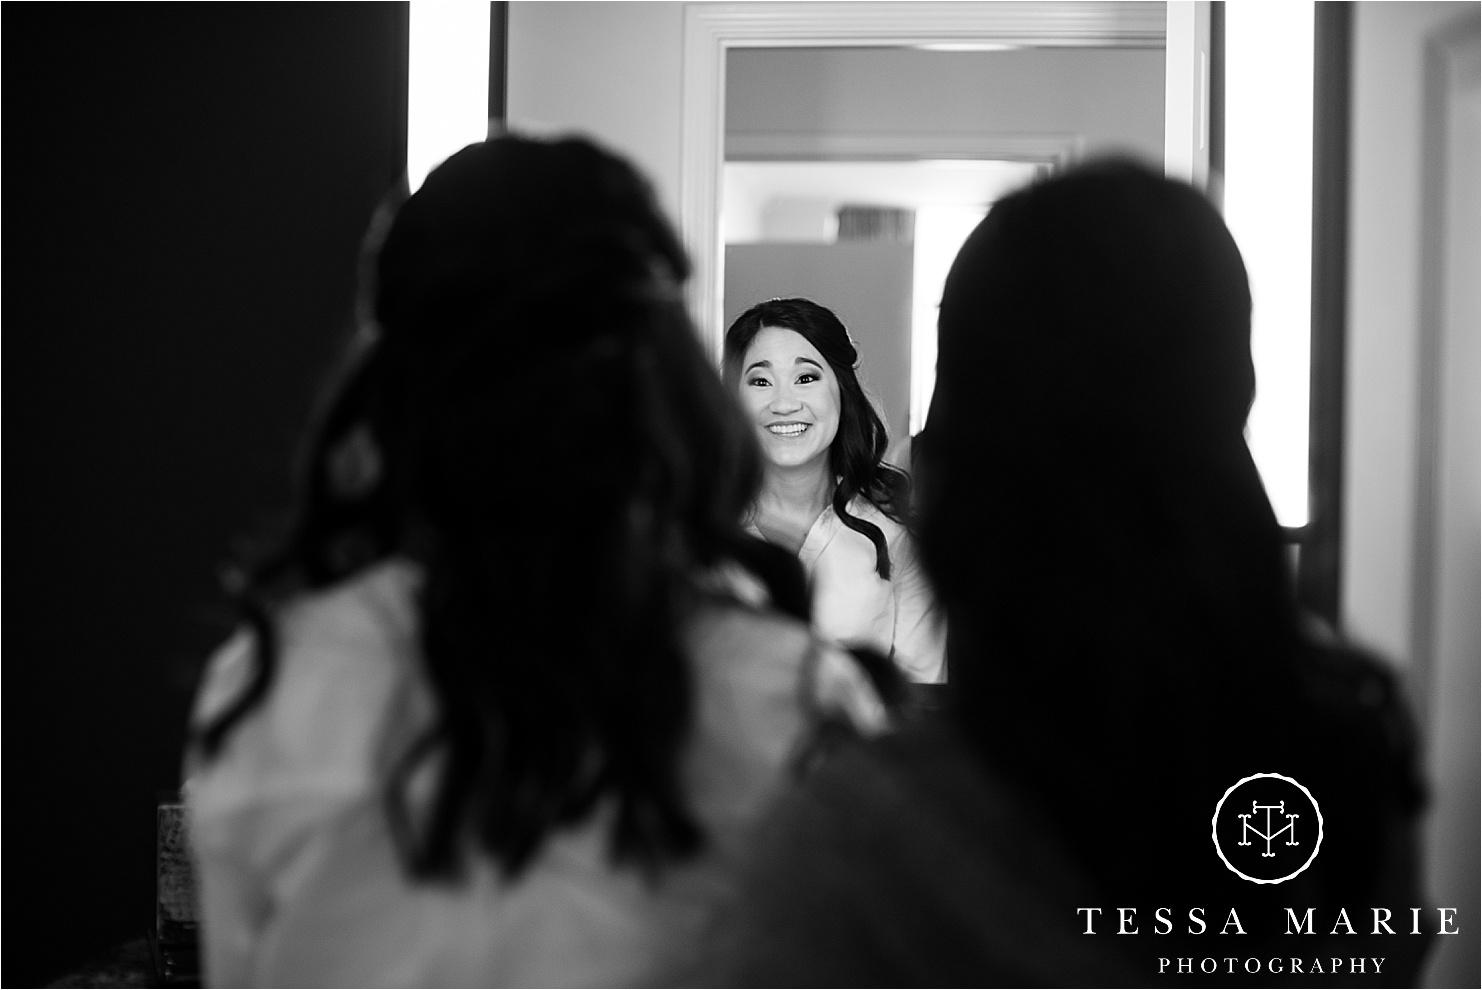 Tessa_marie_weddings_houston_wedding_photographer_The_astorian_0010.jpg